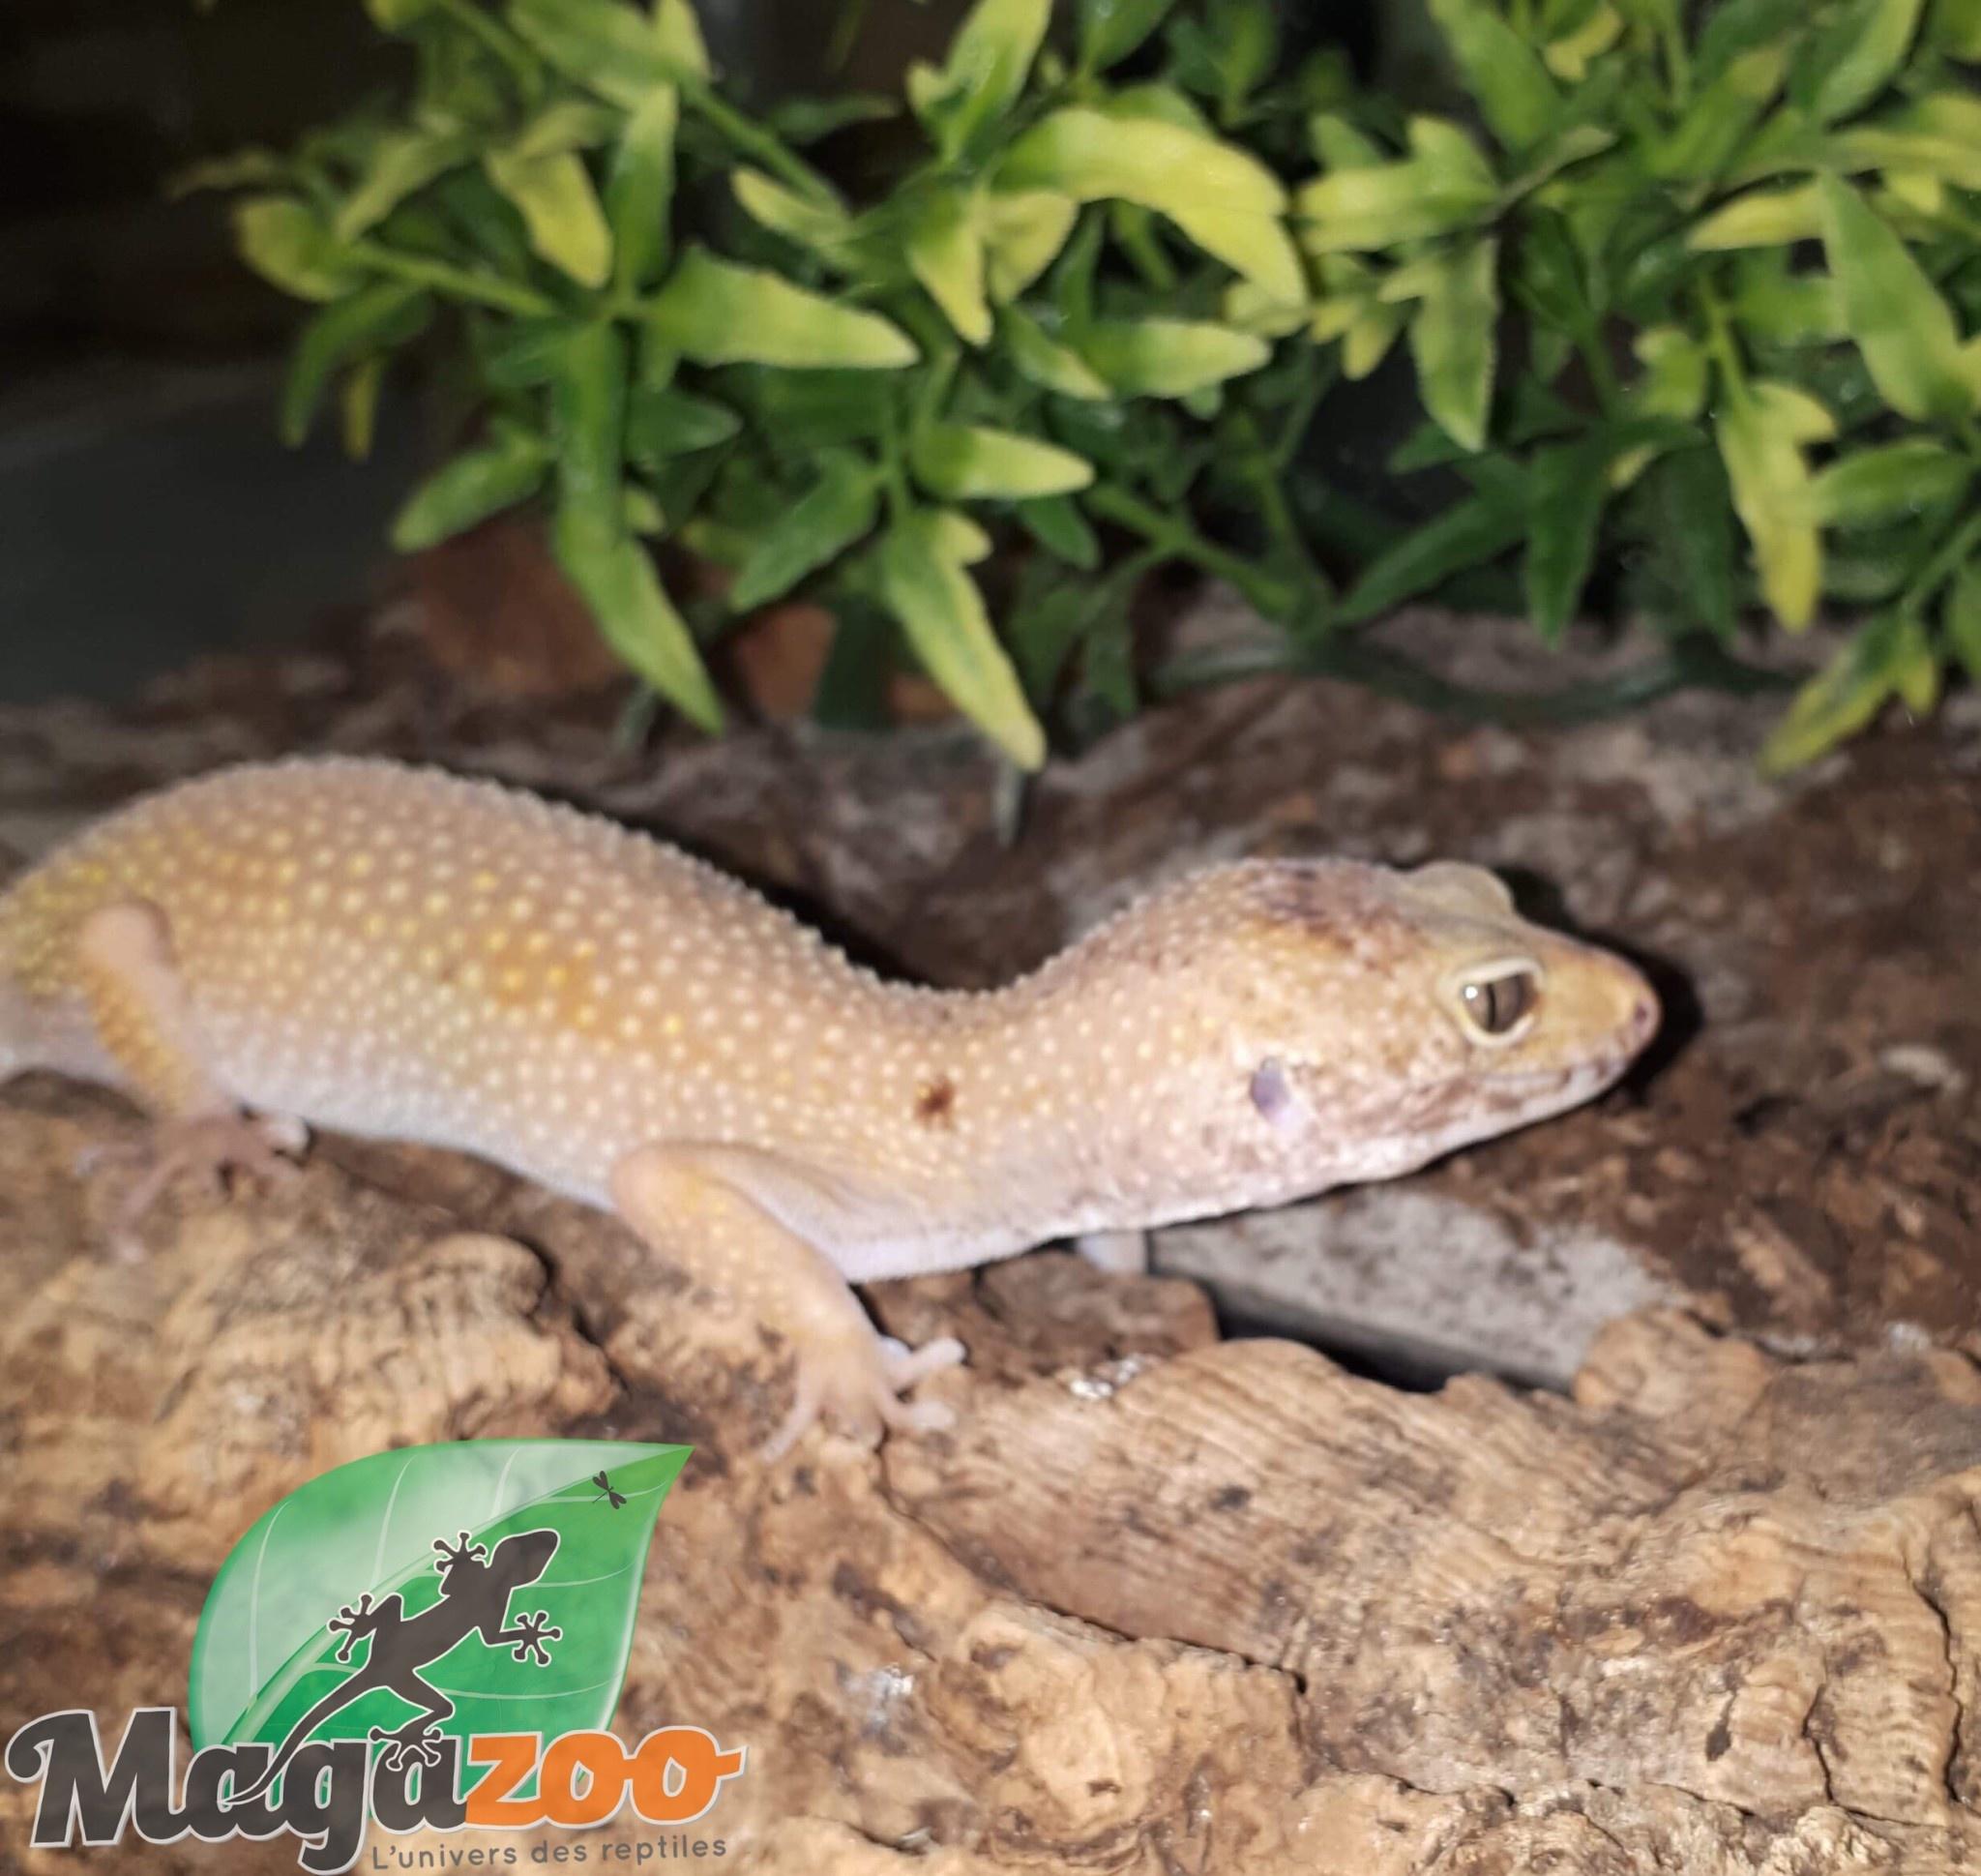 Magazoo Gecko léopard Enigma tangerine femelle - Adoption - 2ième chance